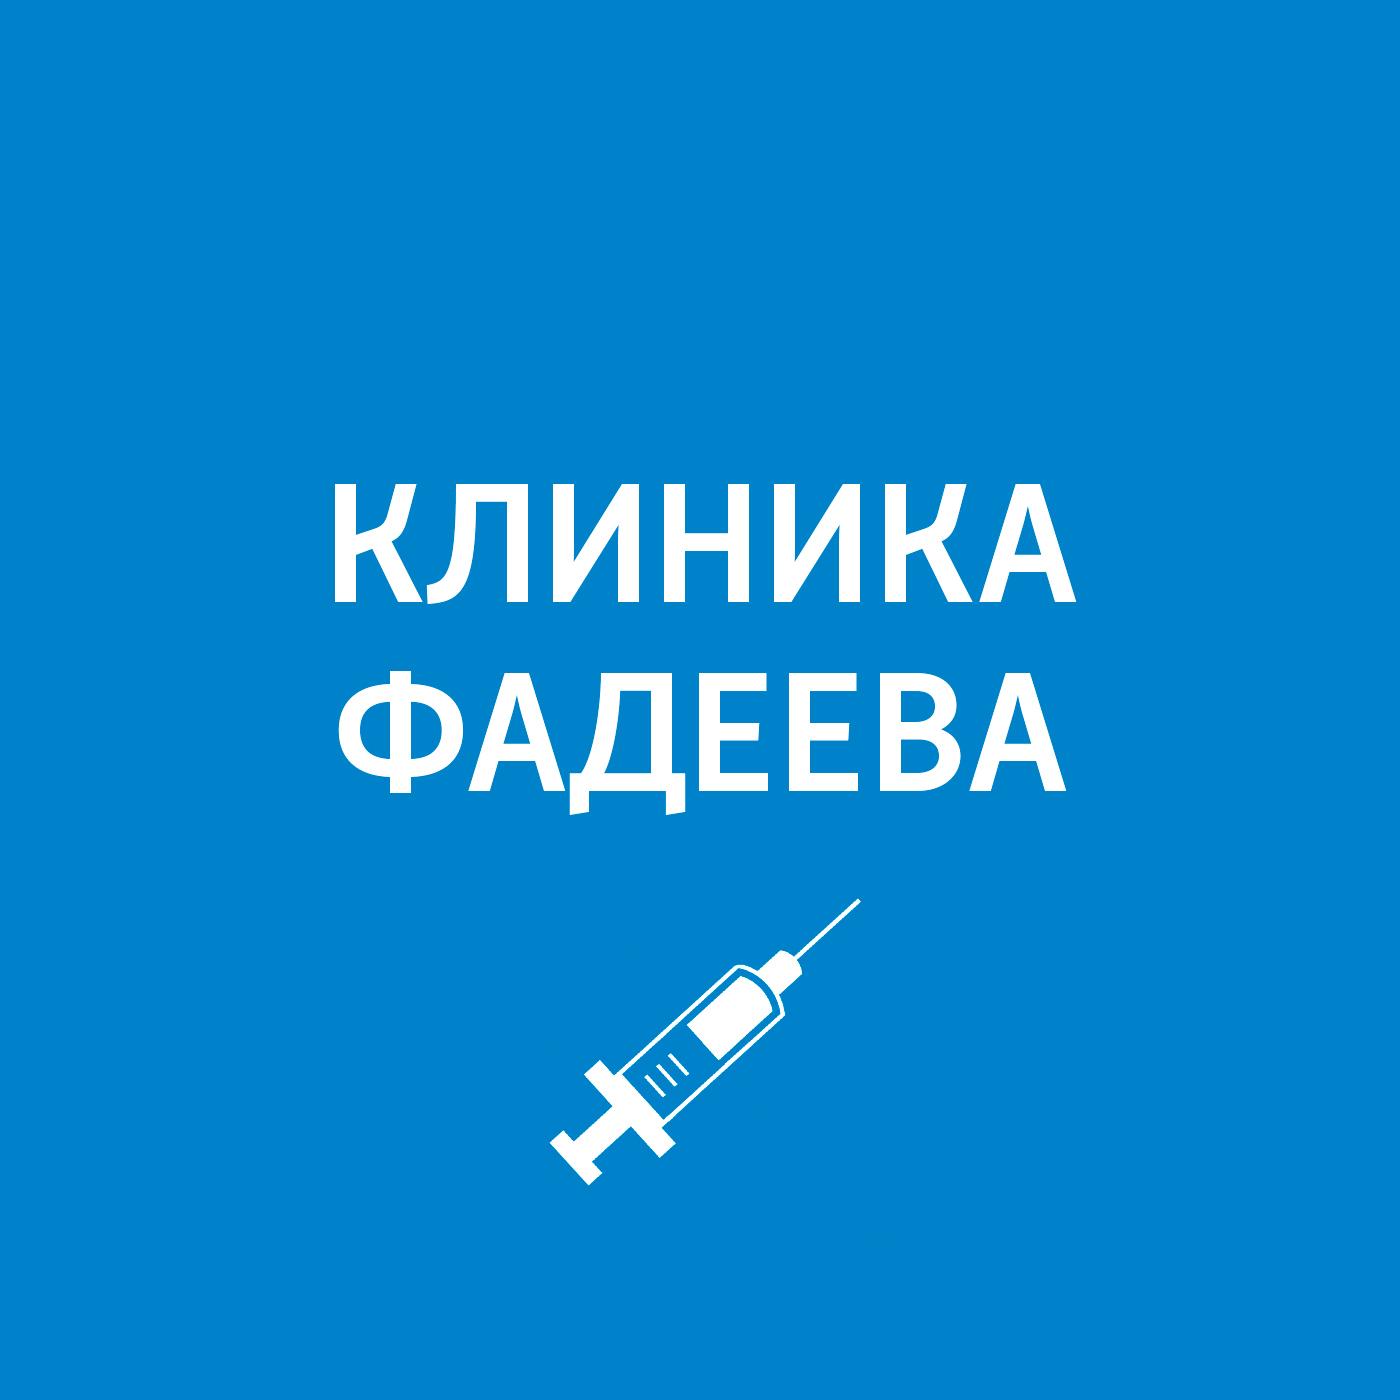 Фото - Пётр Фадеев Врач-офтальмолог пётр фадеев врач неотложной помощи